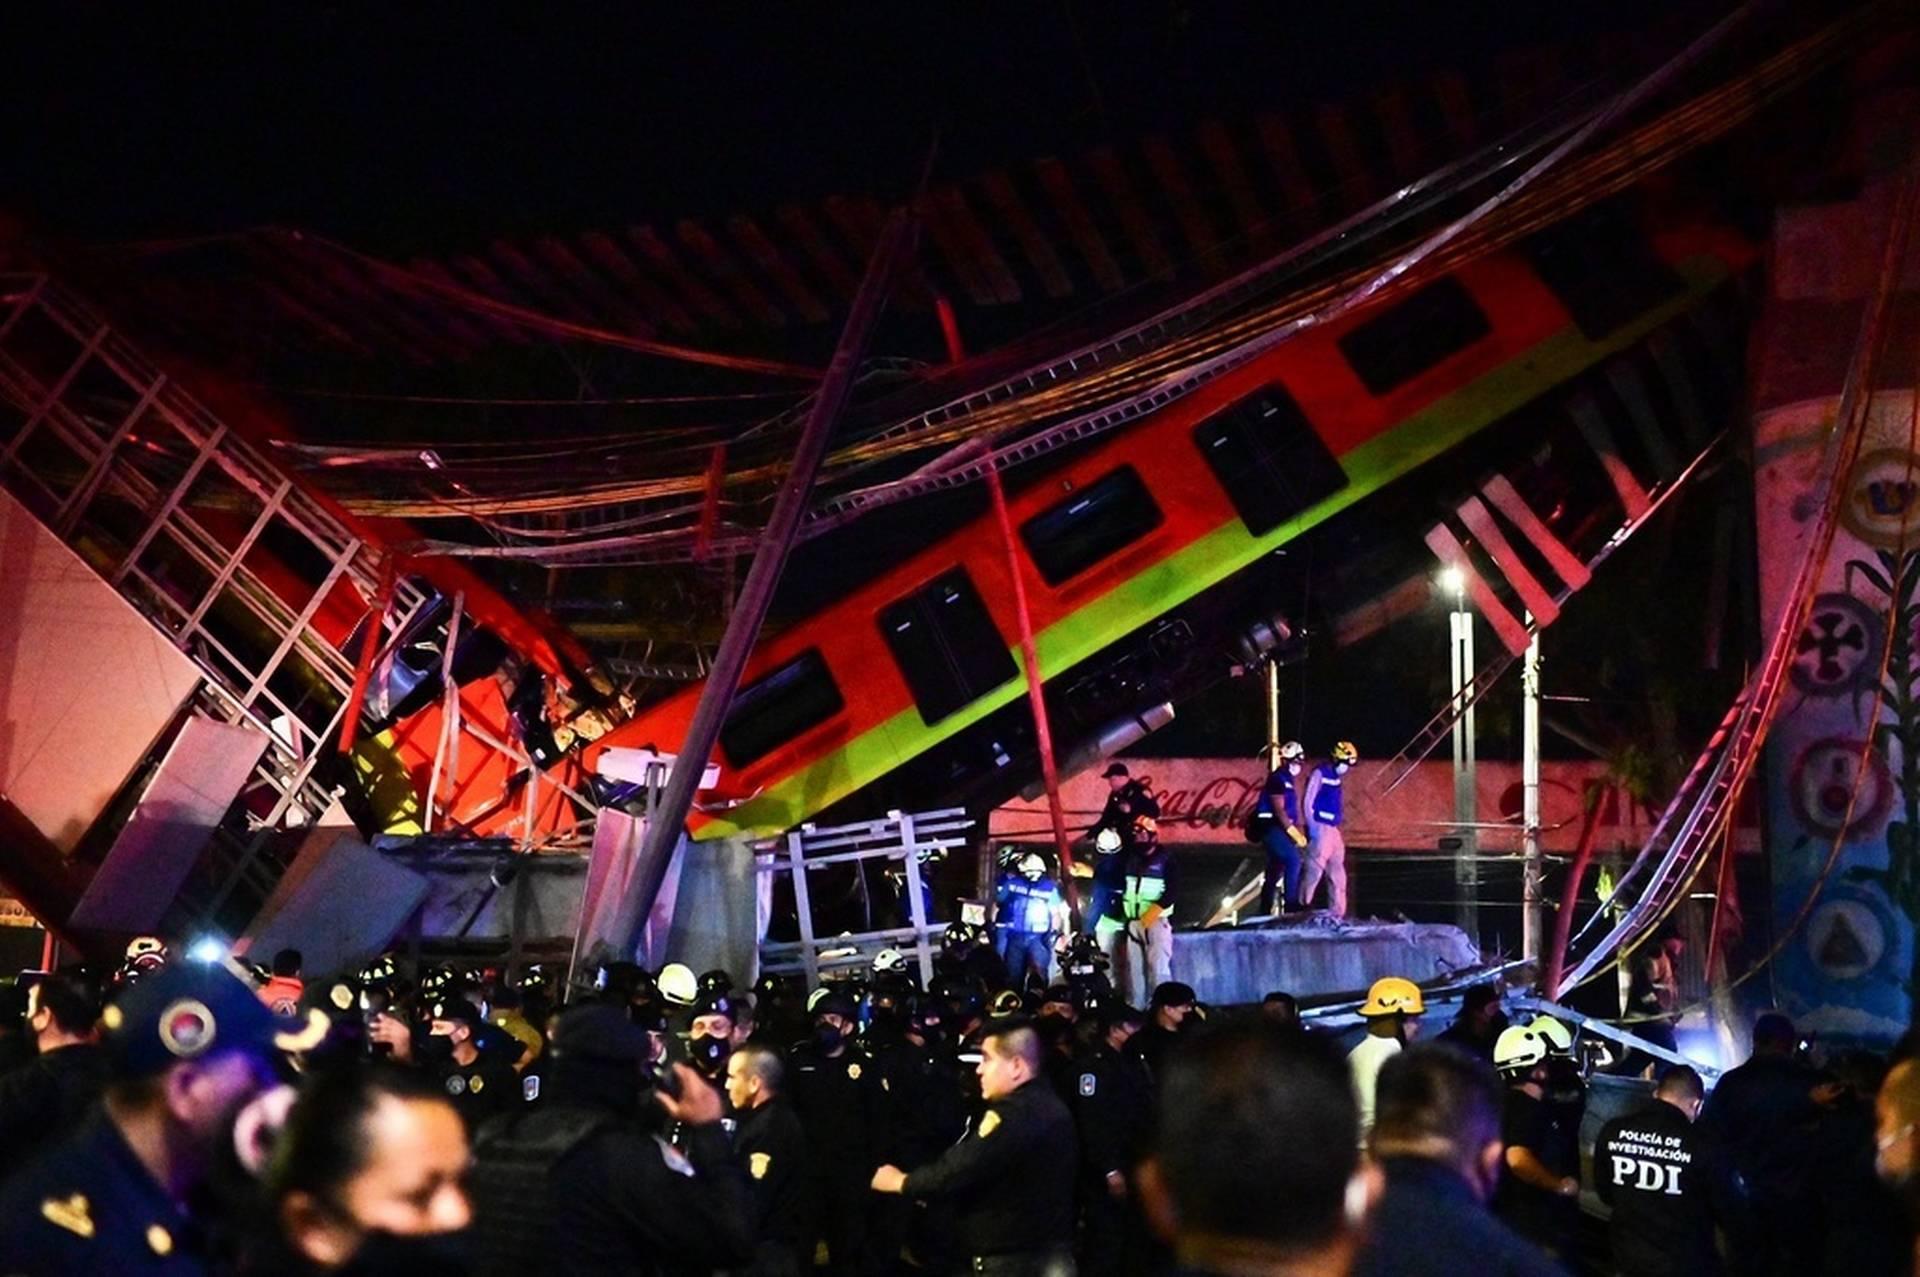 Subway trains crashed across the road – bridge collapsed